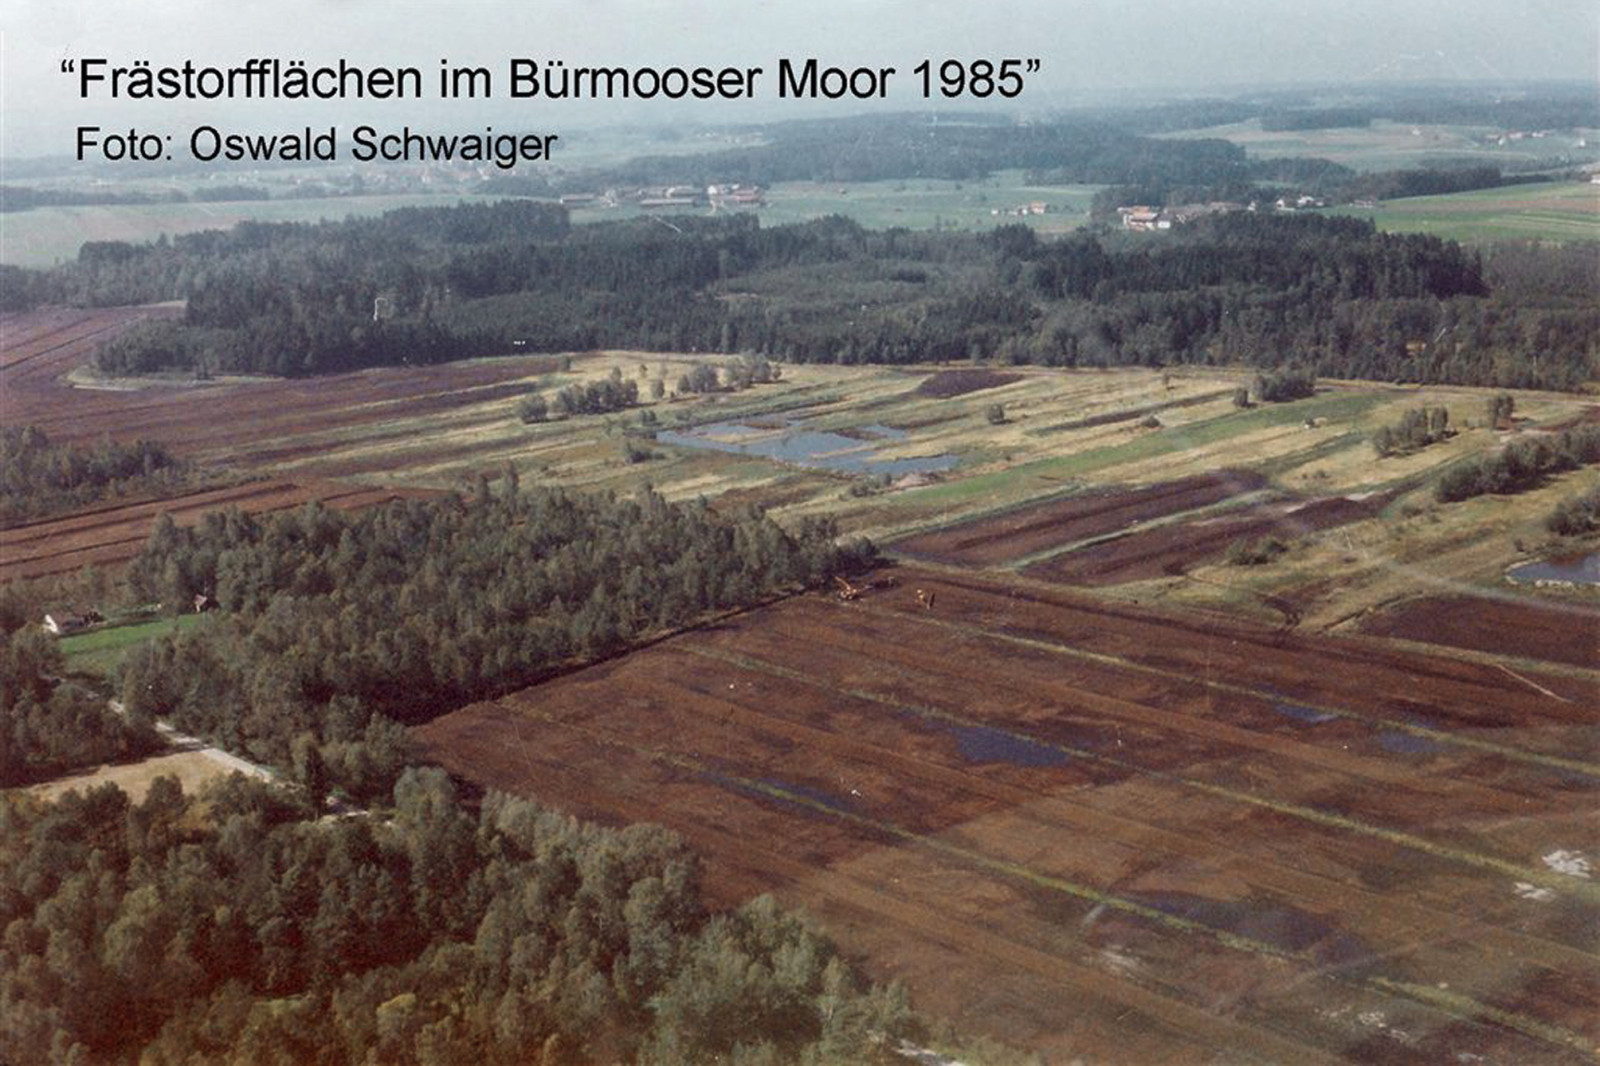 Zerstörung: So sah das Bürmooser Moor noch 1985 aus.